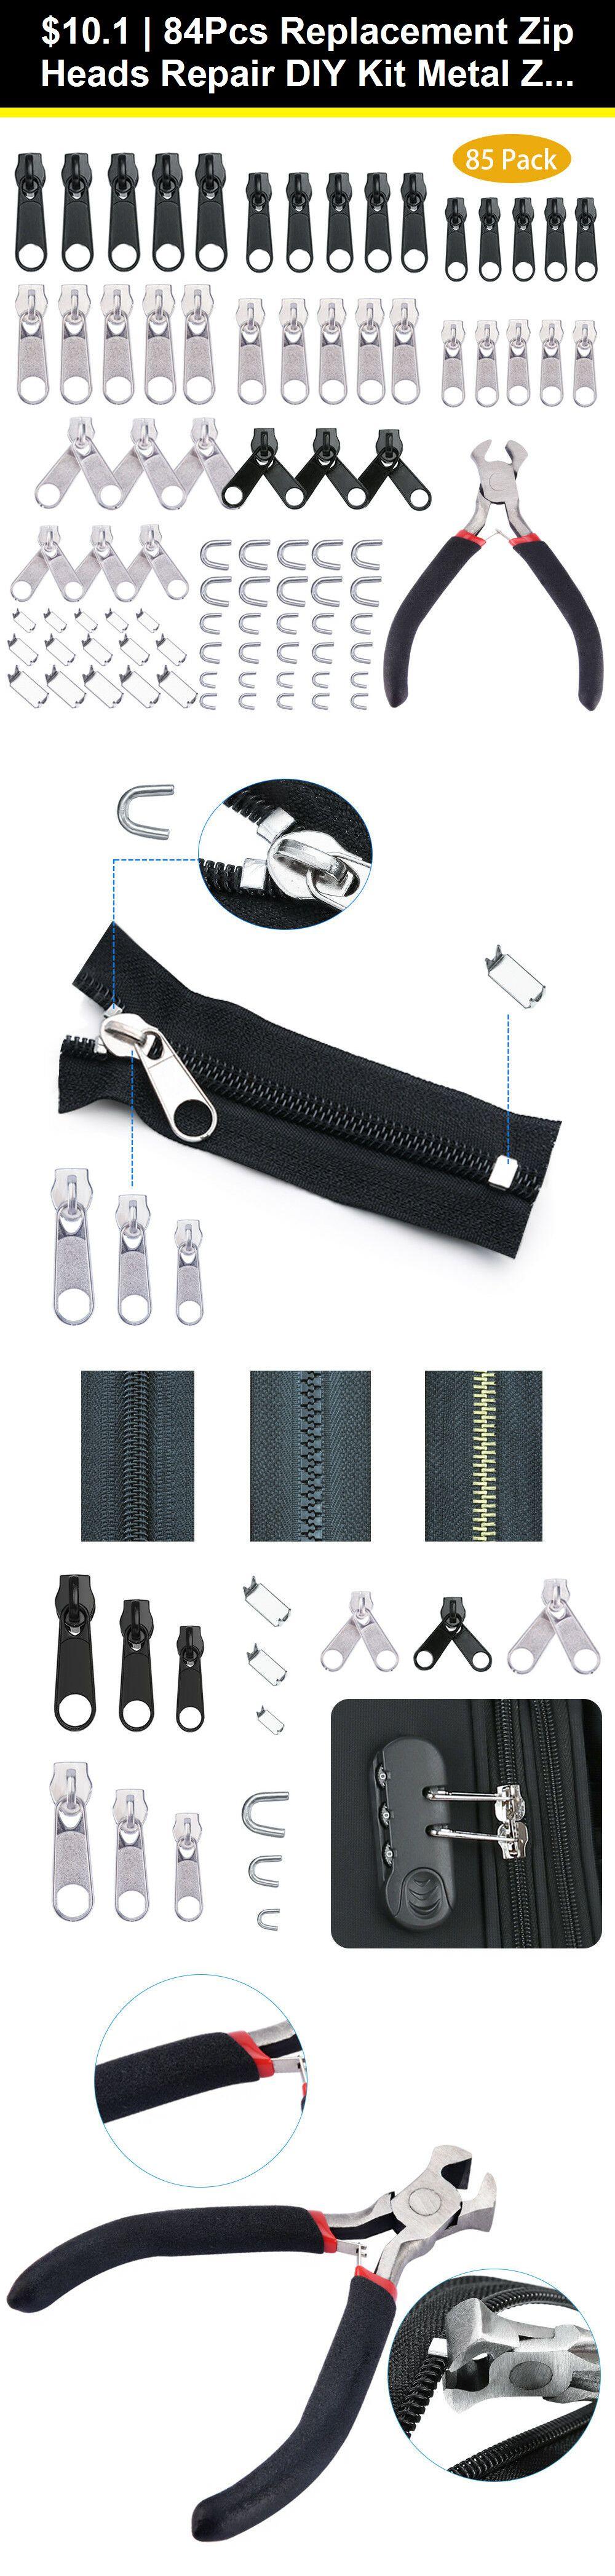 84Pcs Replacement Zipper Zip Repair Fixer Kit Metal Head Install Pliers Home DIY